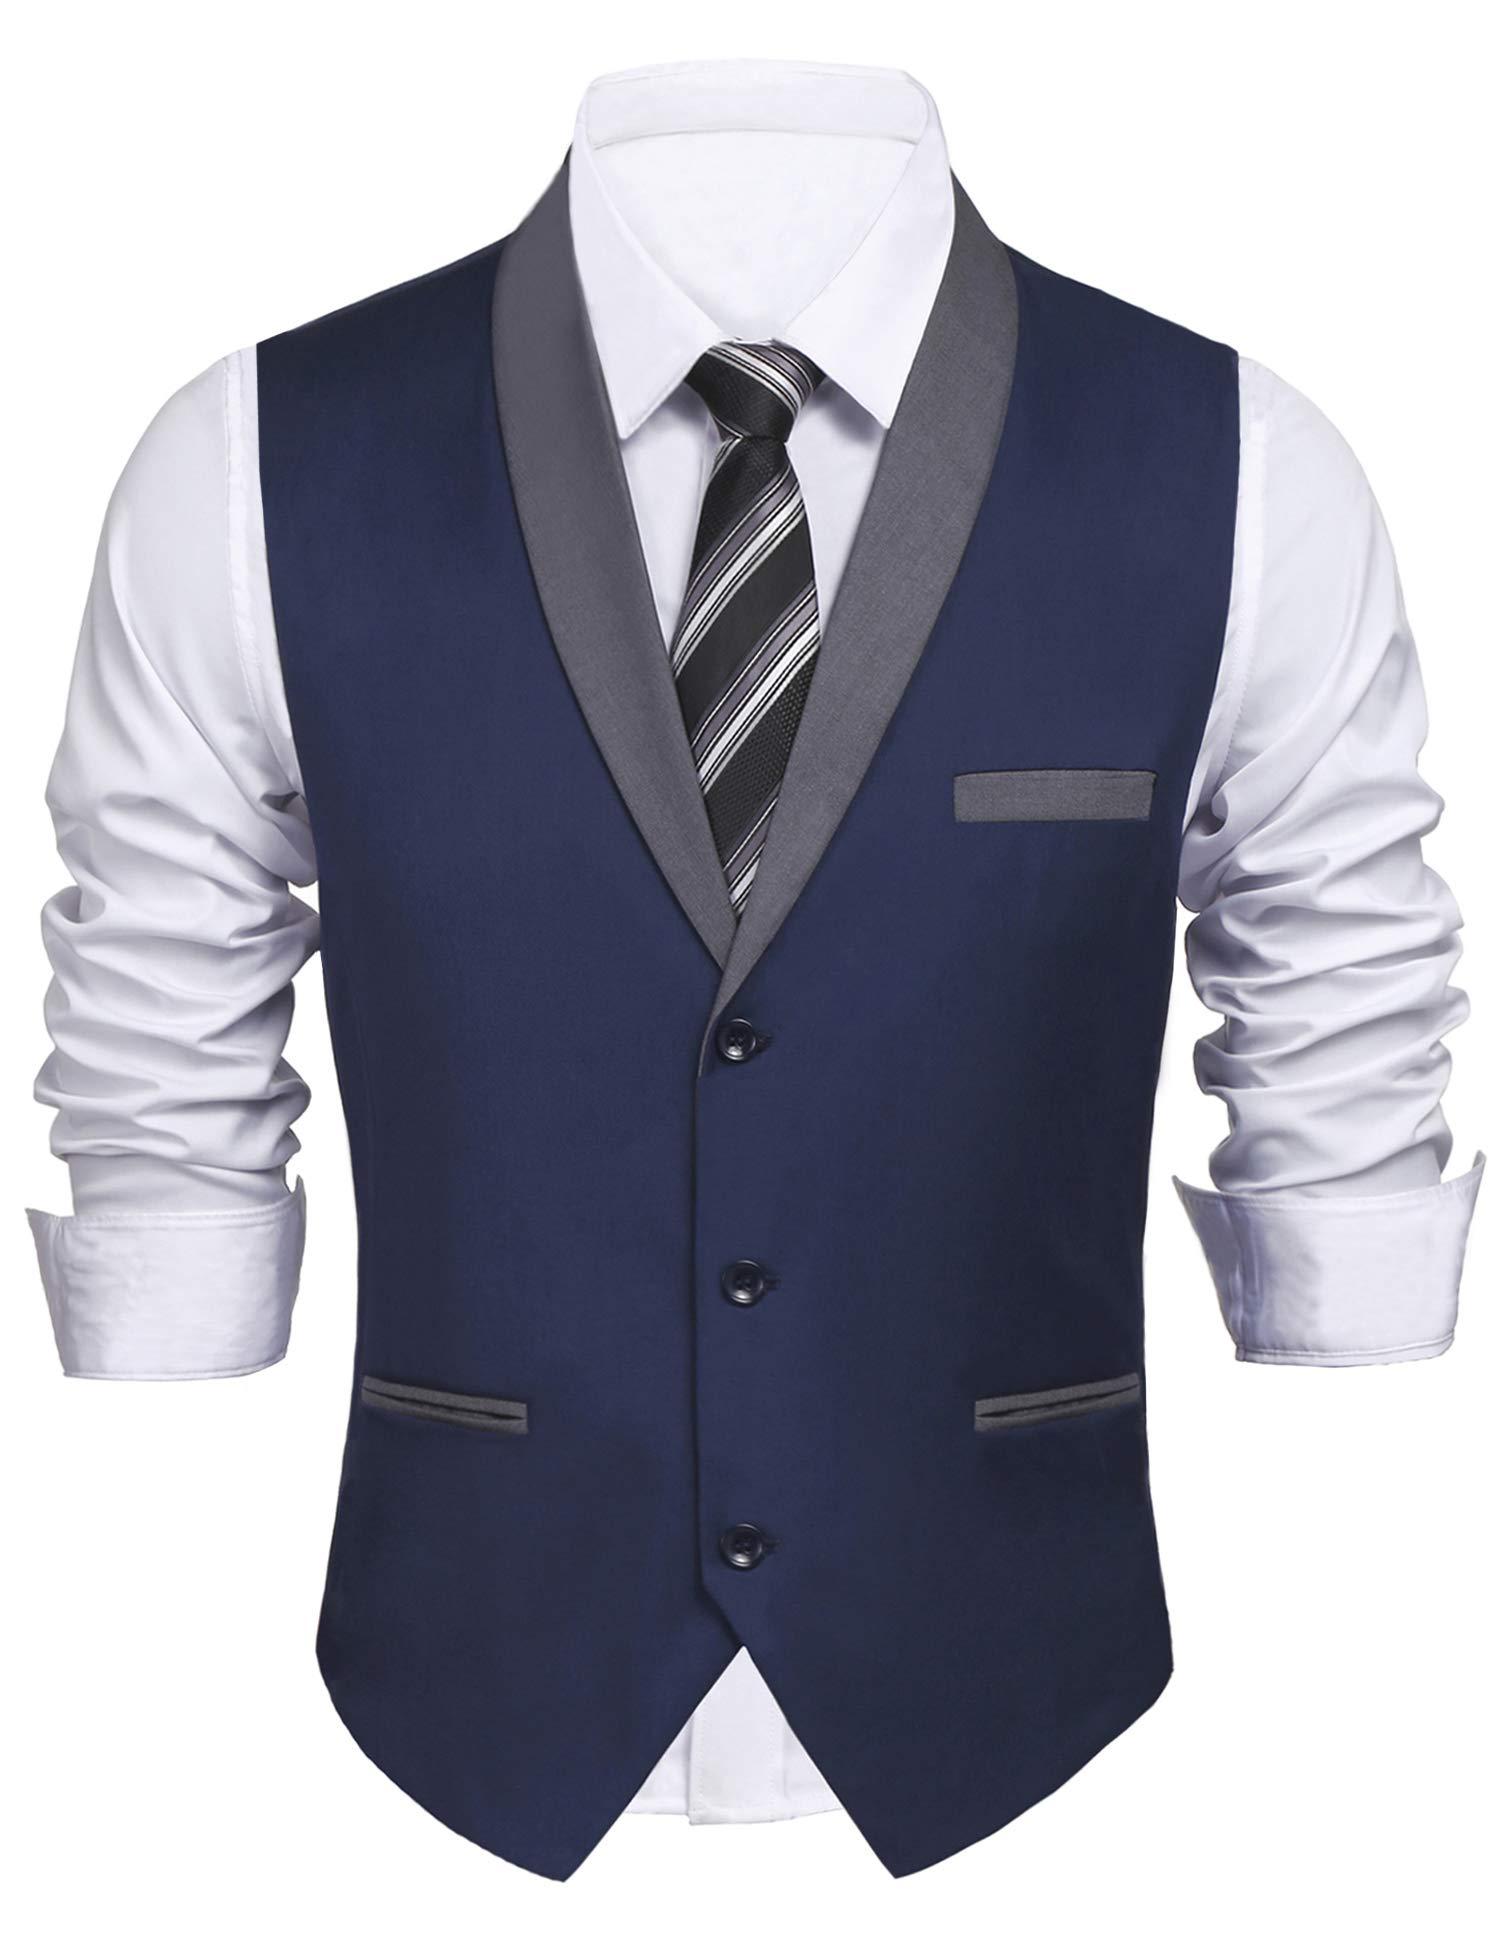 Daupanzees Mens Business Suit Vest Slim Fit 3 Pockets 3 Buttons V-Neck Wedding Sleeveless Button Down Waistcoat (Navy Blue L)